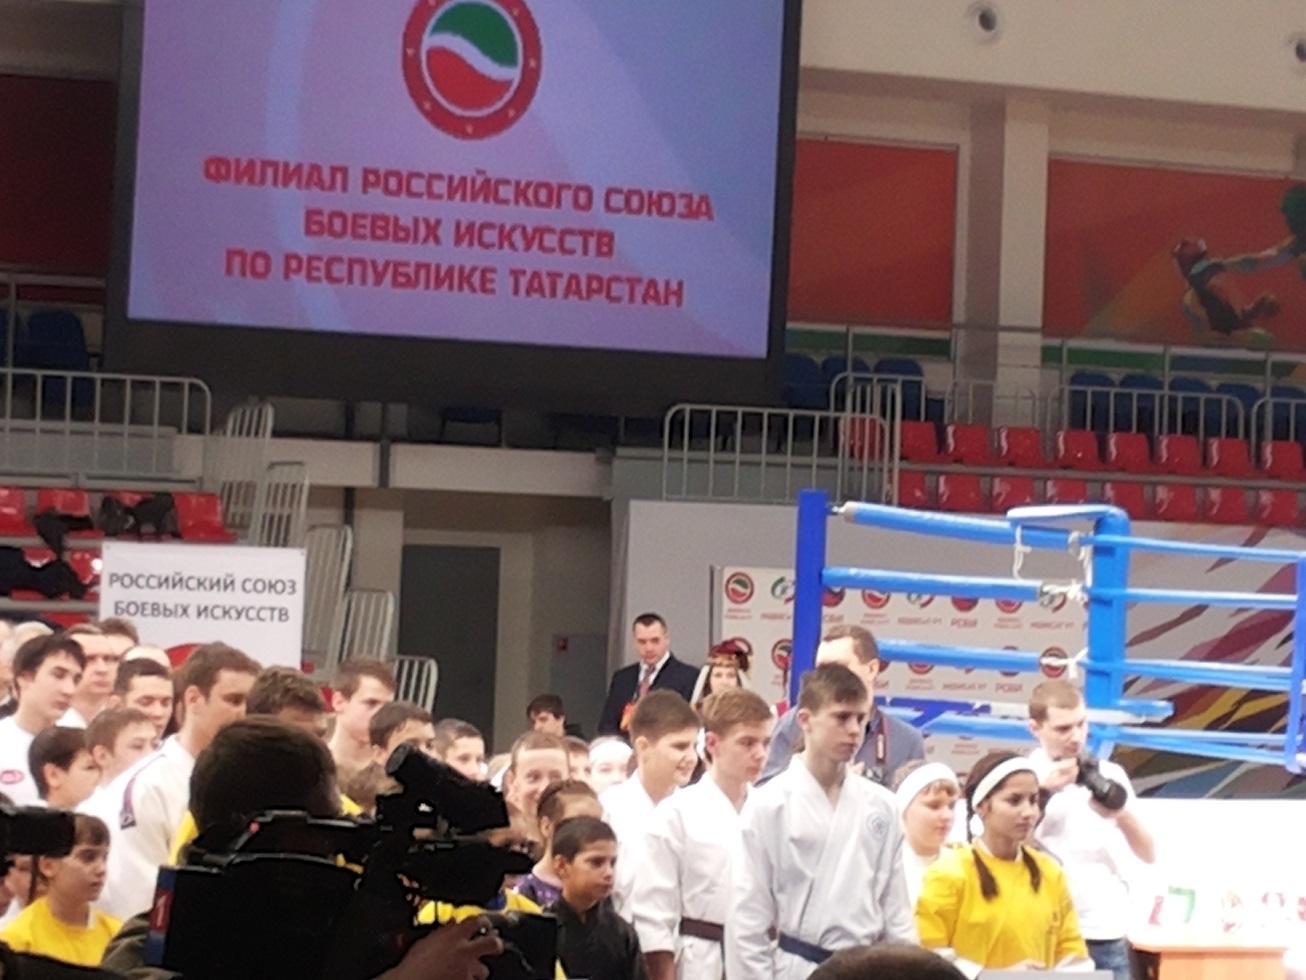 http://www.combatsd.ru/images/upload/20140222_102447.jpg